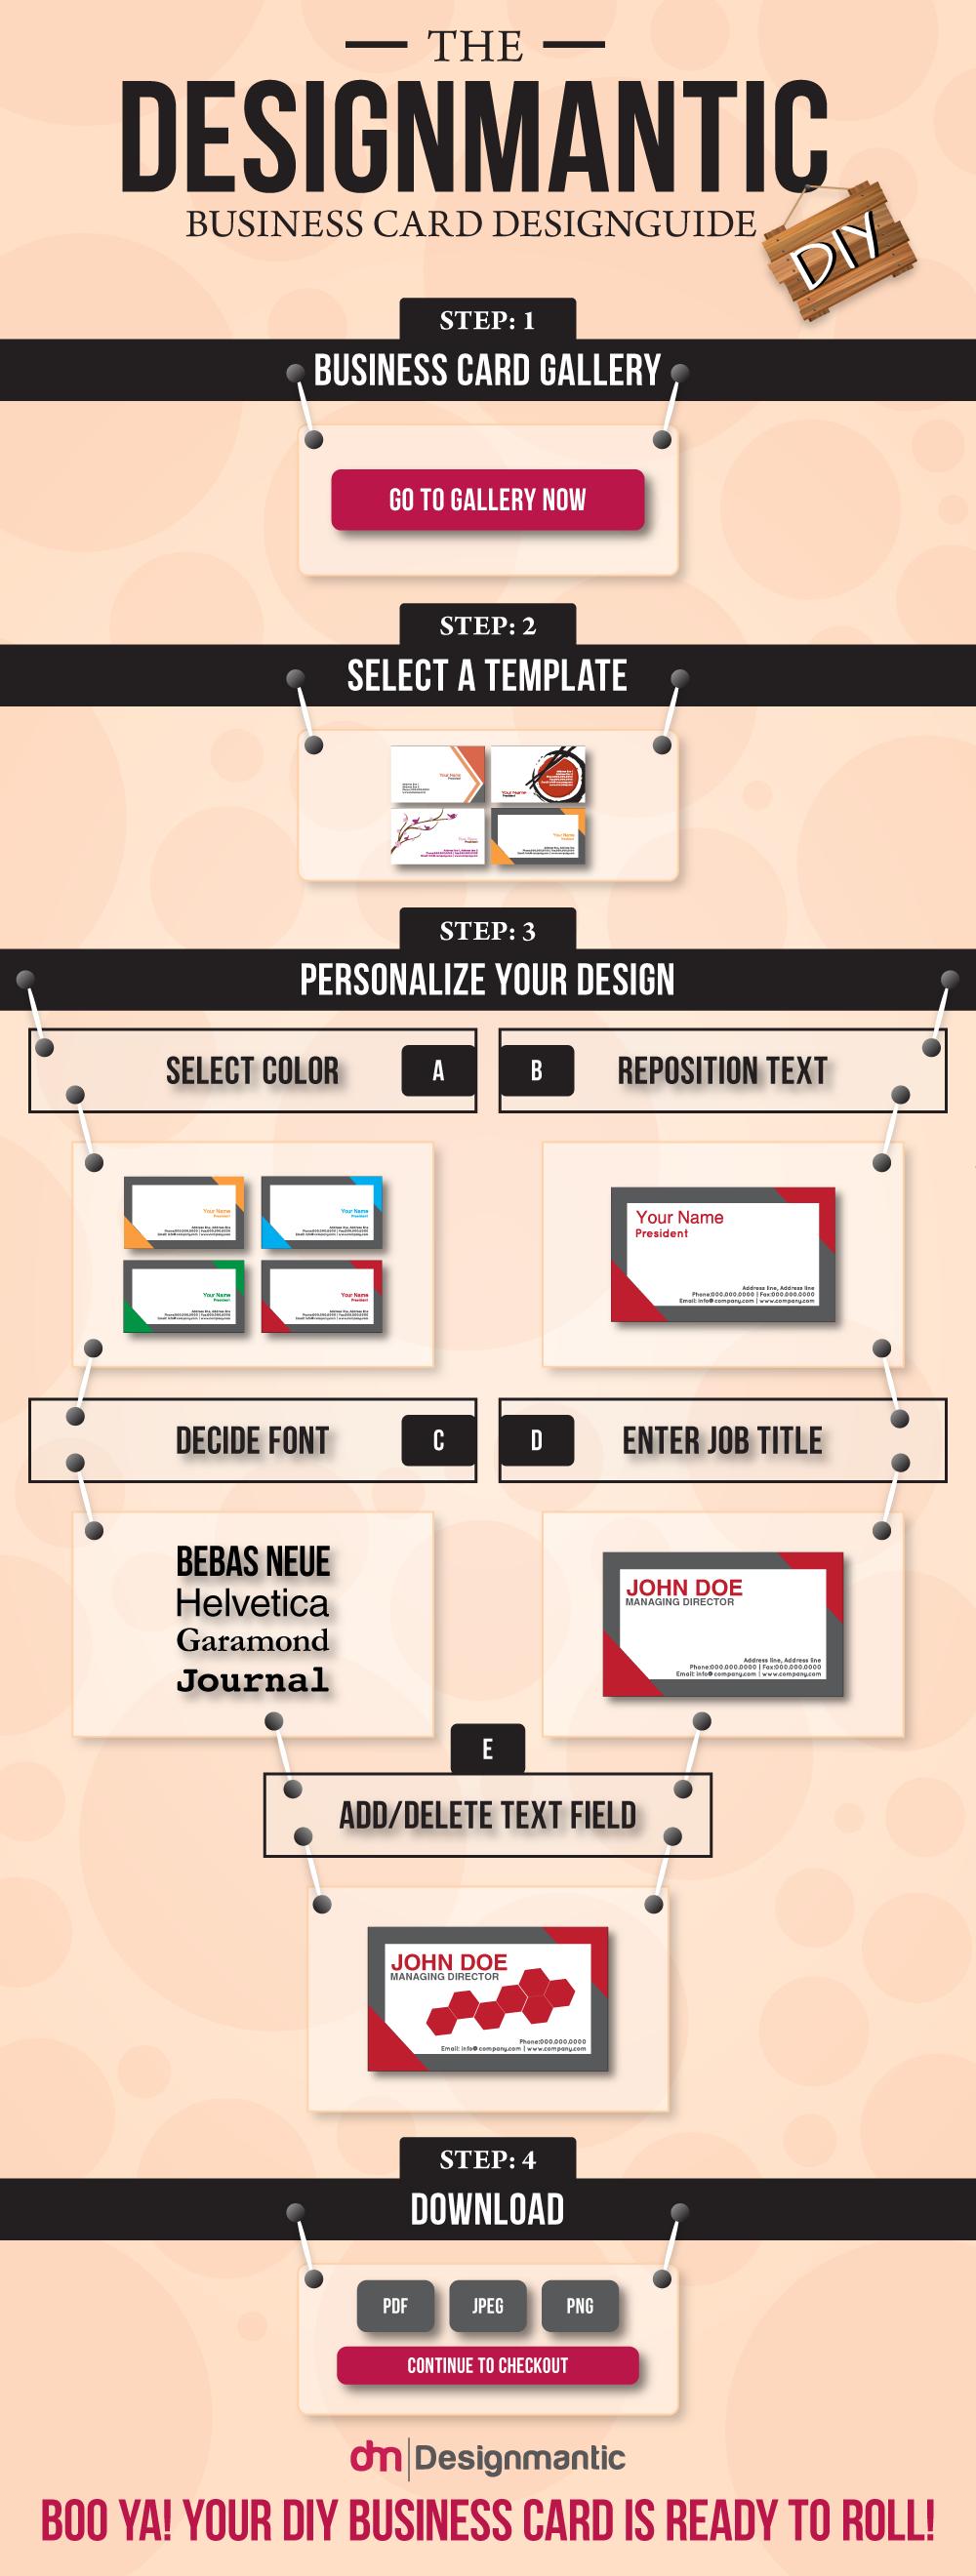 DIY Business Card Design Guide